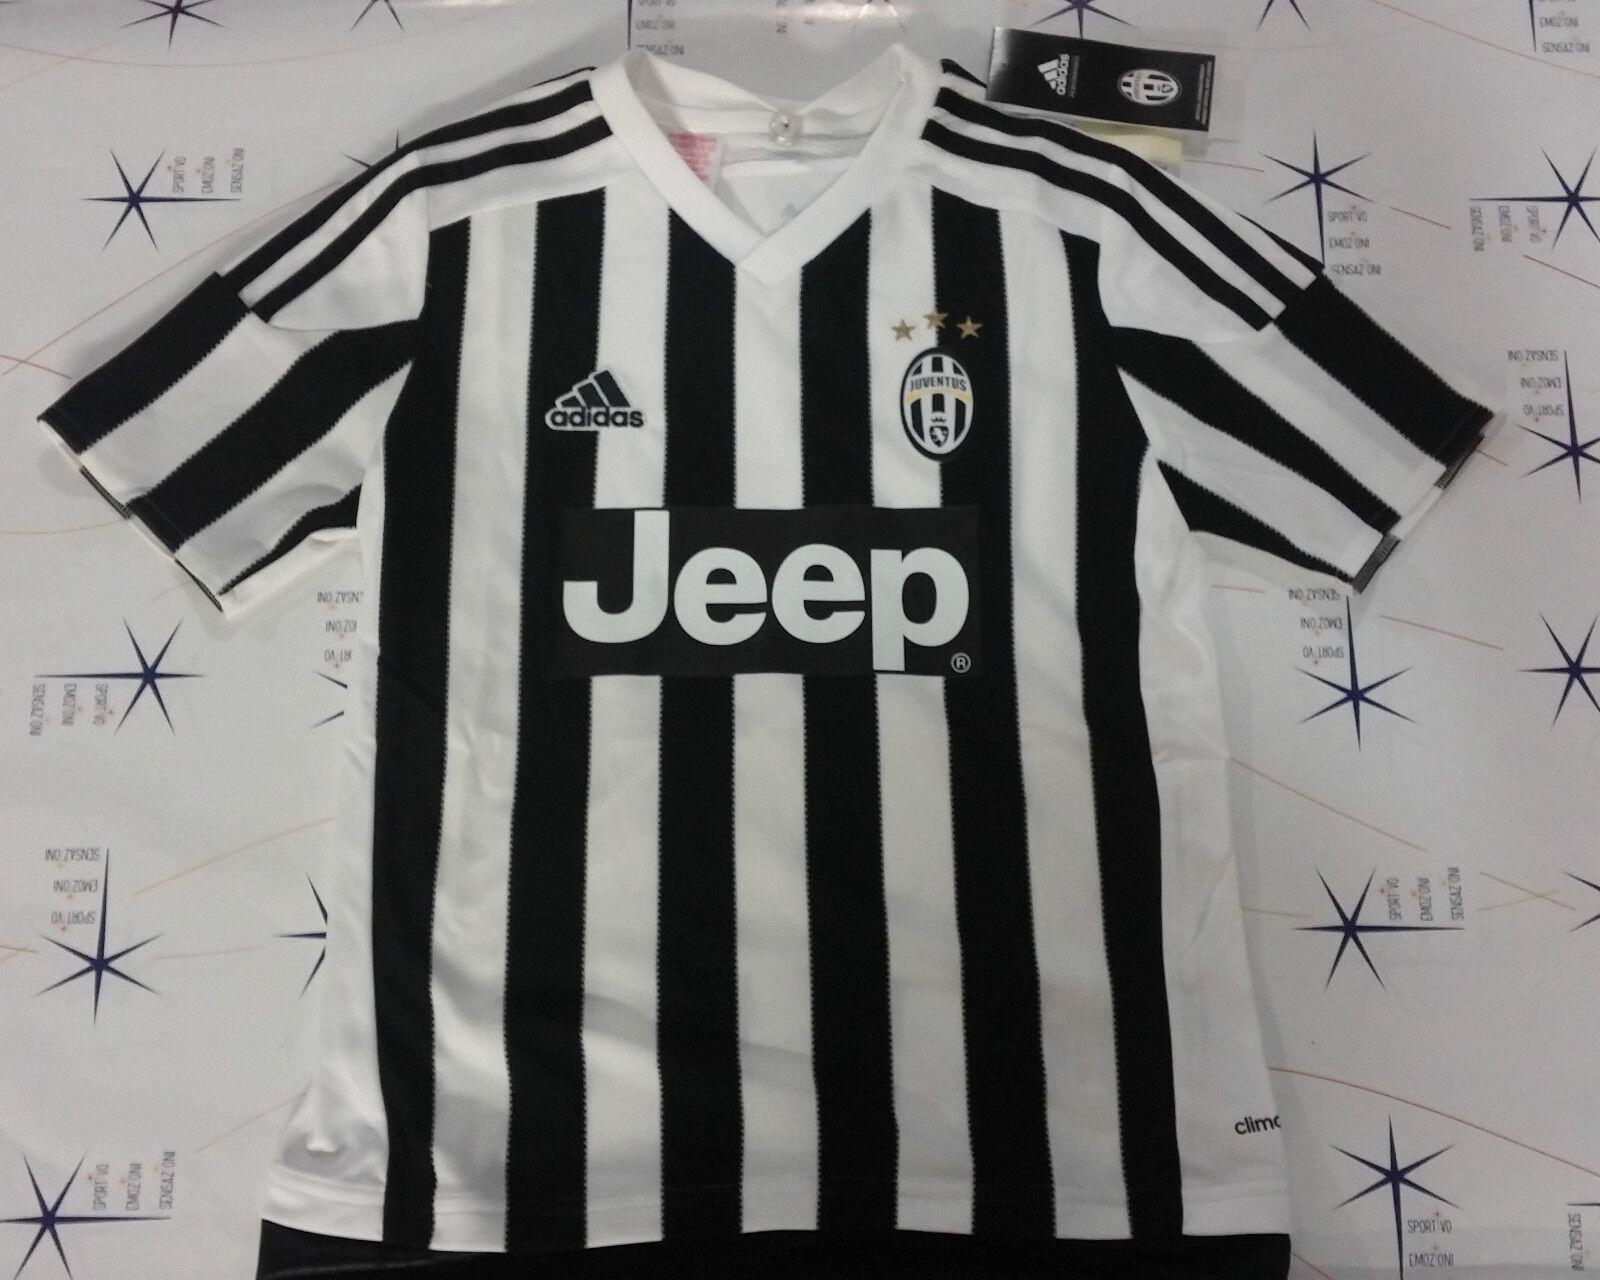 59112b27e Adidas Juventus t-shirt maglia ufficiale juve bianco bianco bianco - black  2015 - 2016 AA0336 154738